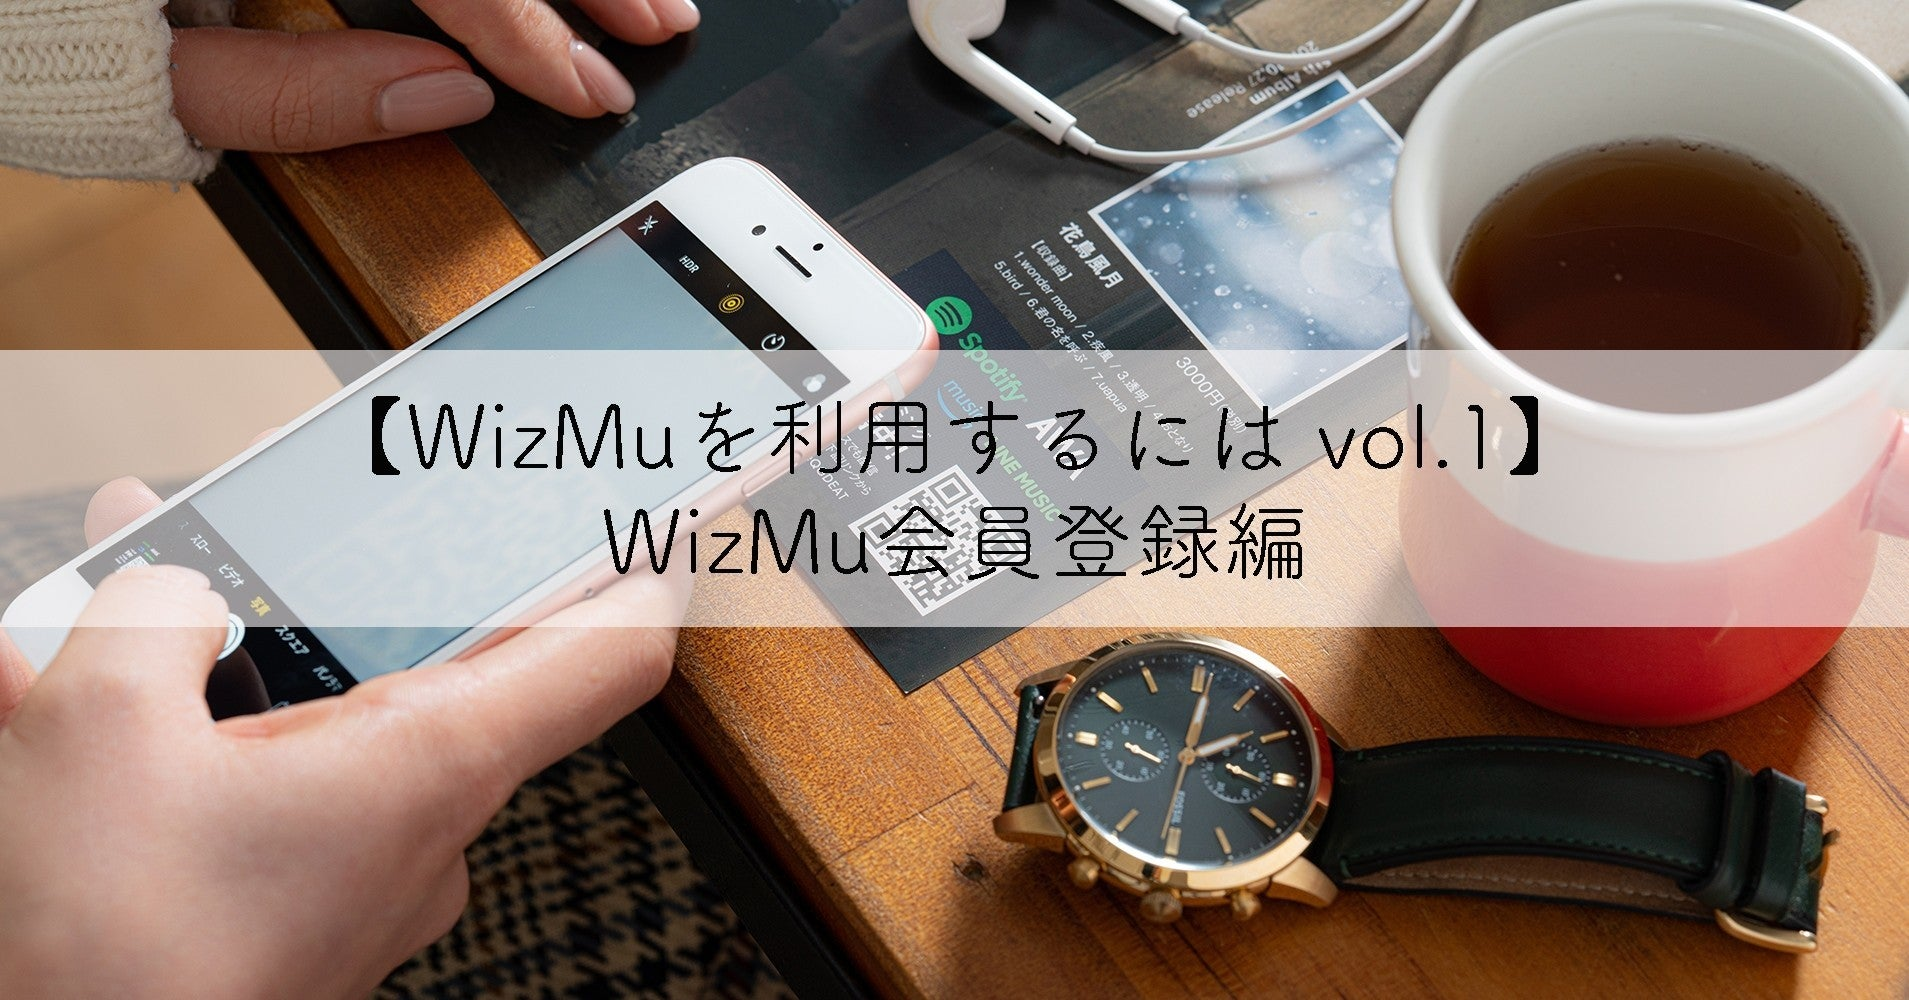 【WizMu を利用するには vol.1】 WizMu会員登録編